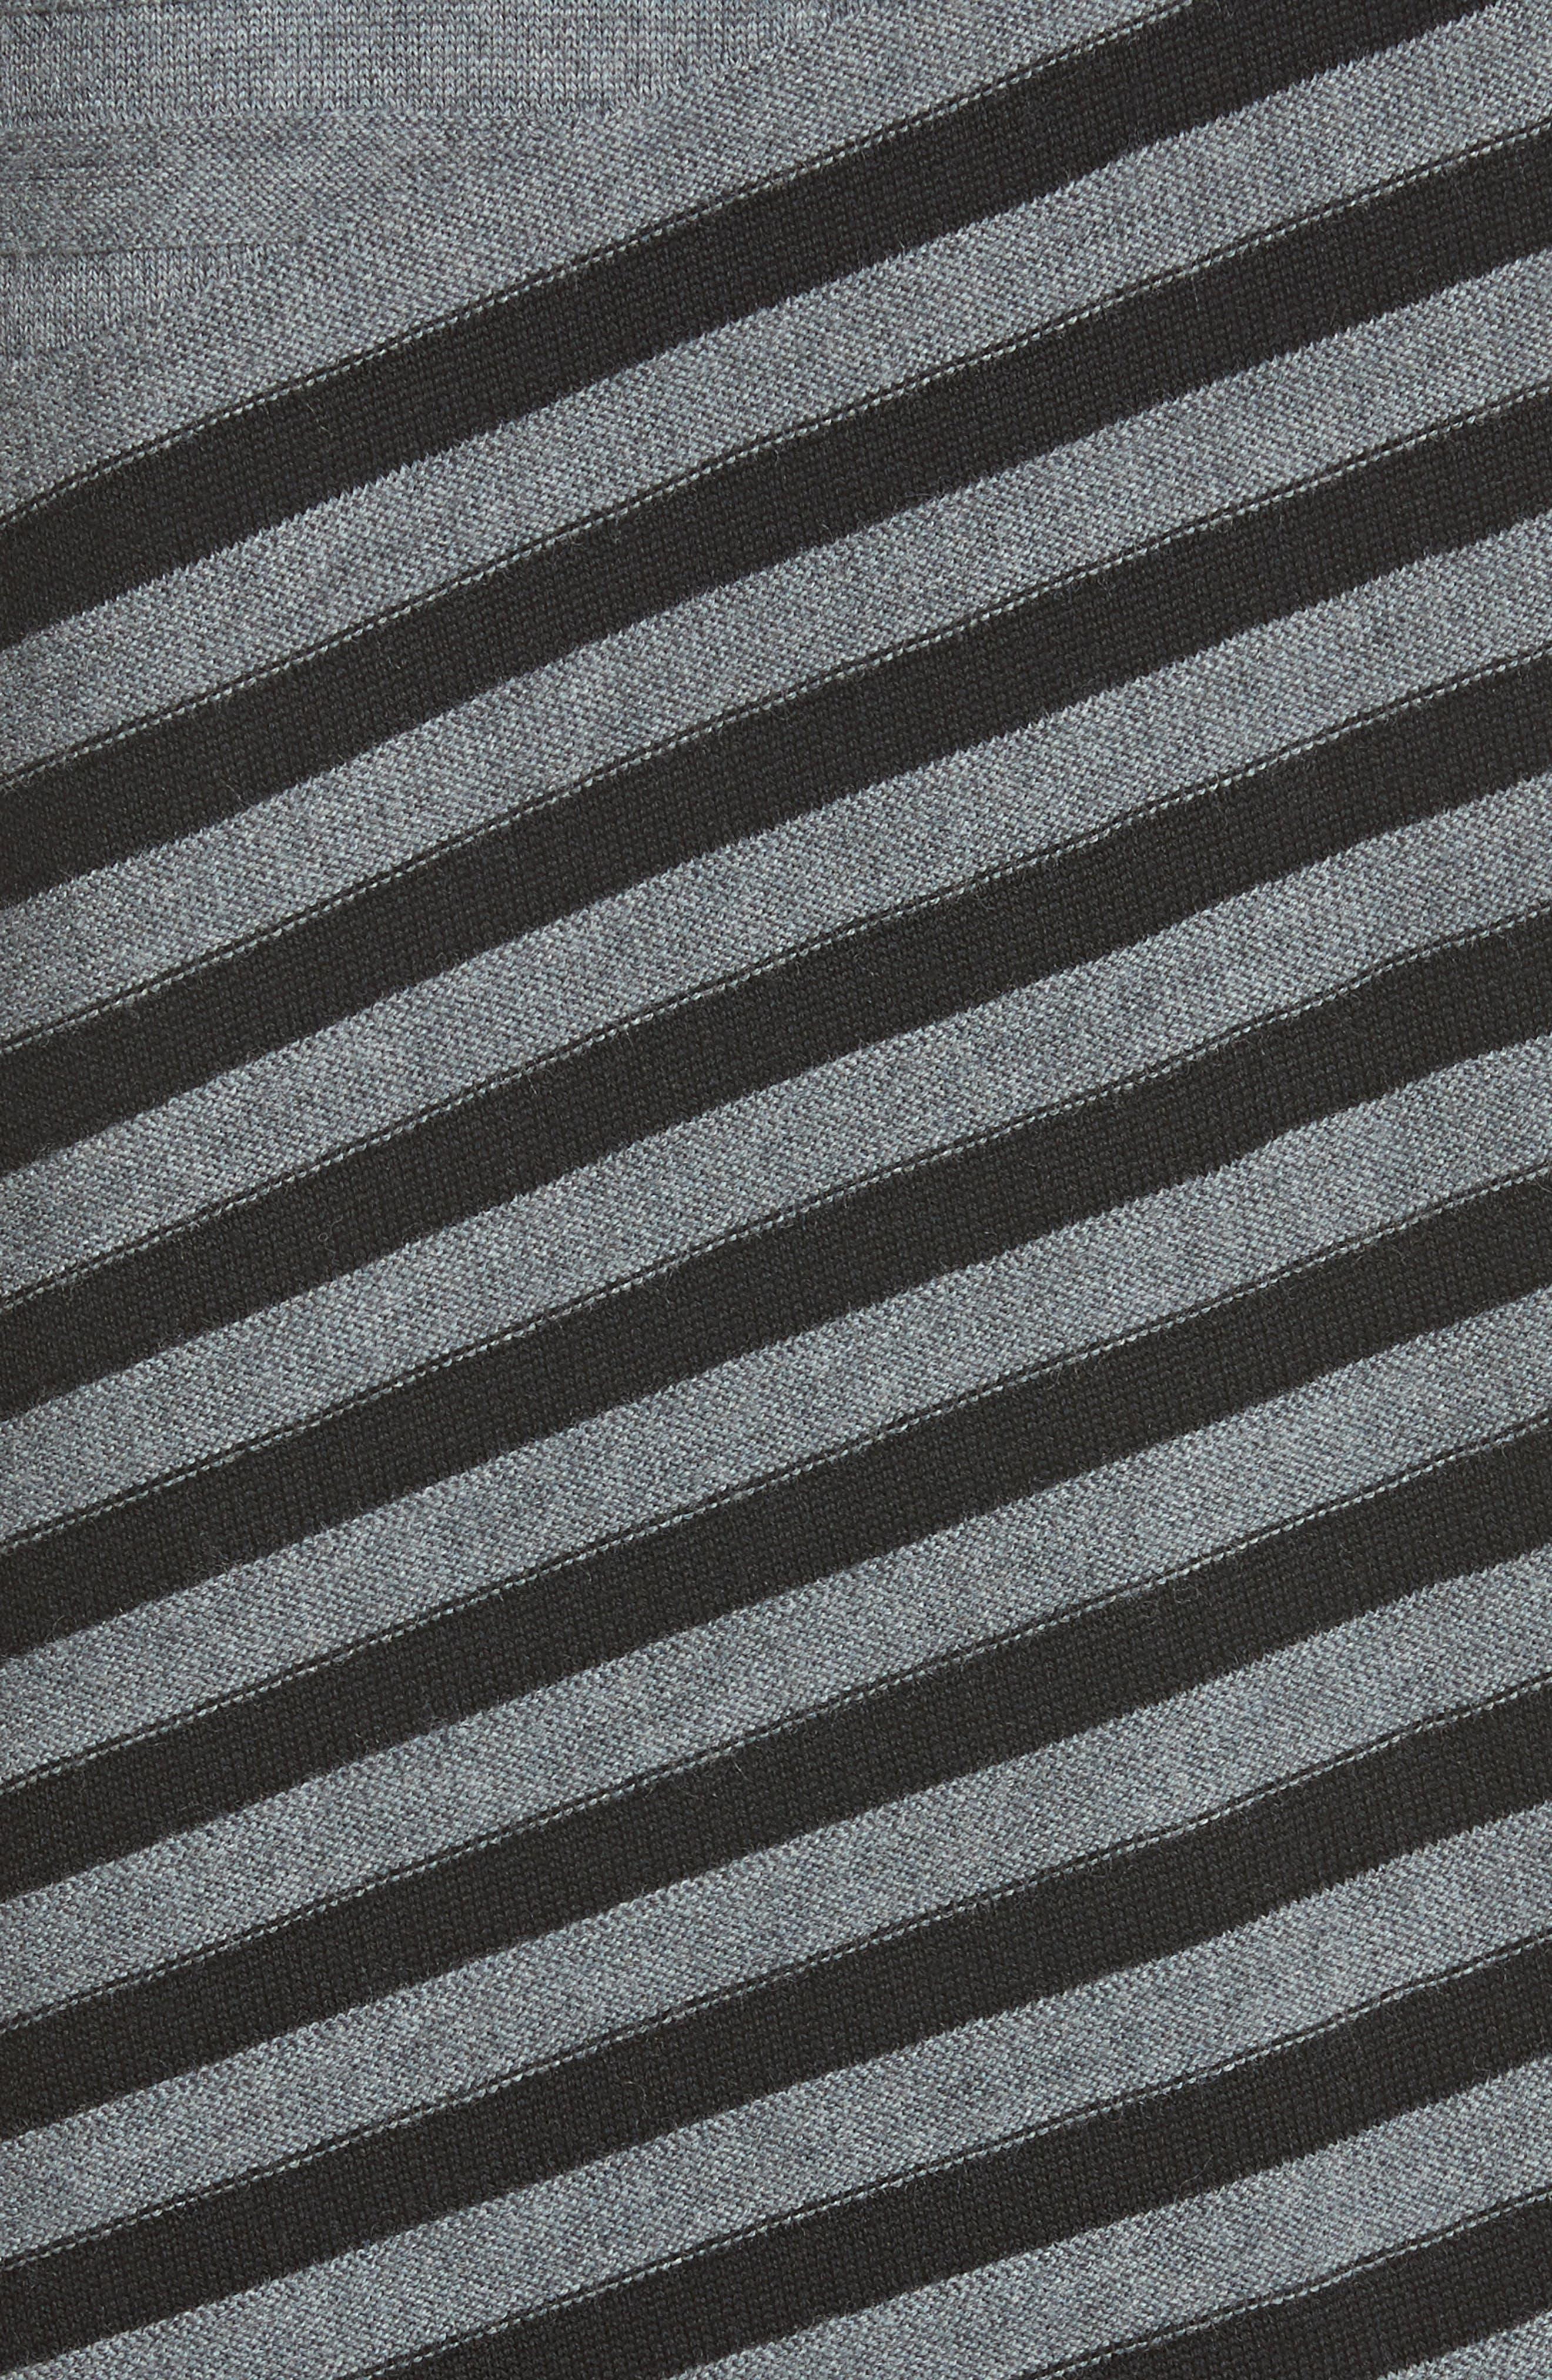 Stripe Wool Asymmetrical Sweater,                             Alternate thumbnail 5, color,                             030